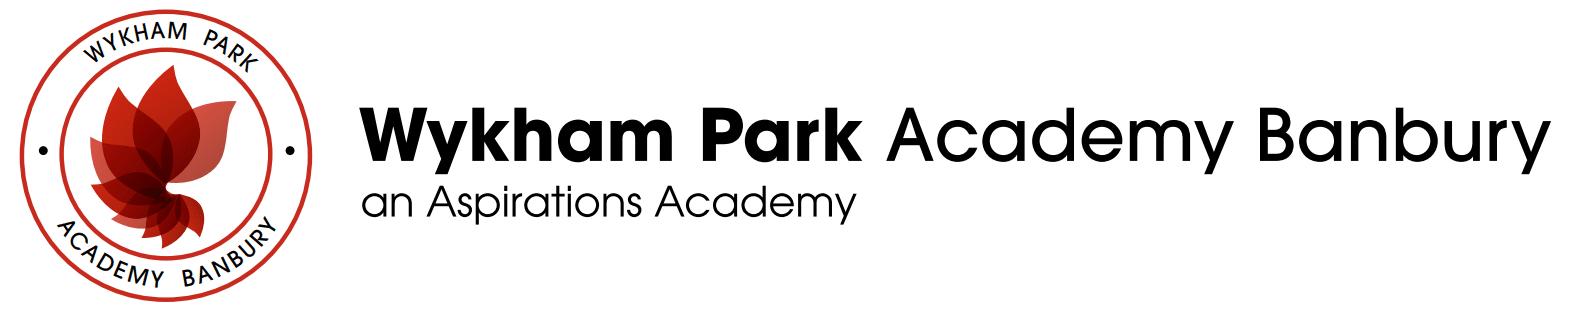 Wykham Park Academy Banbury logo